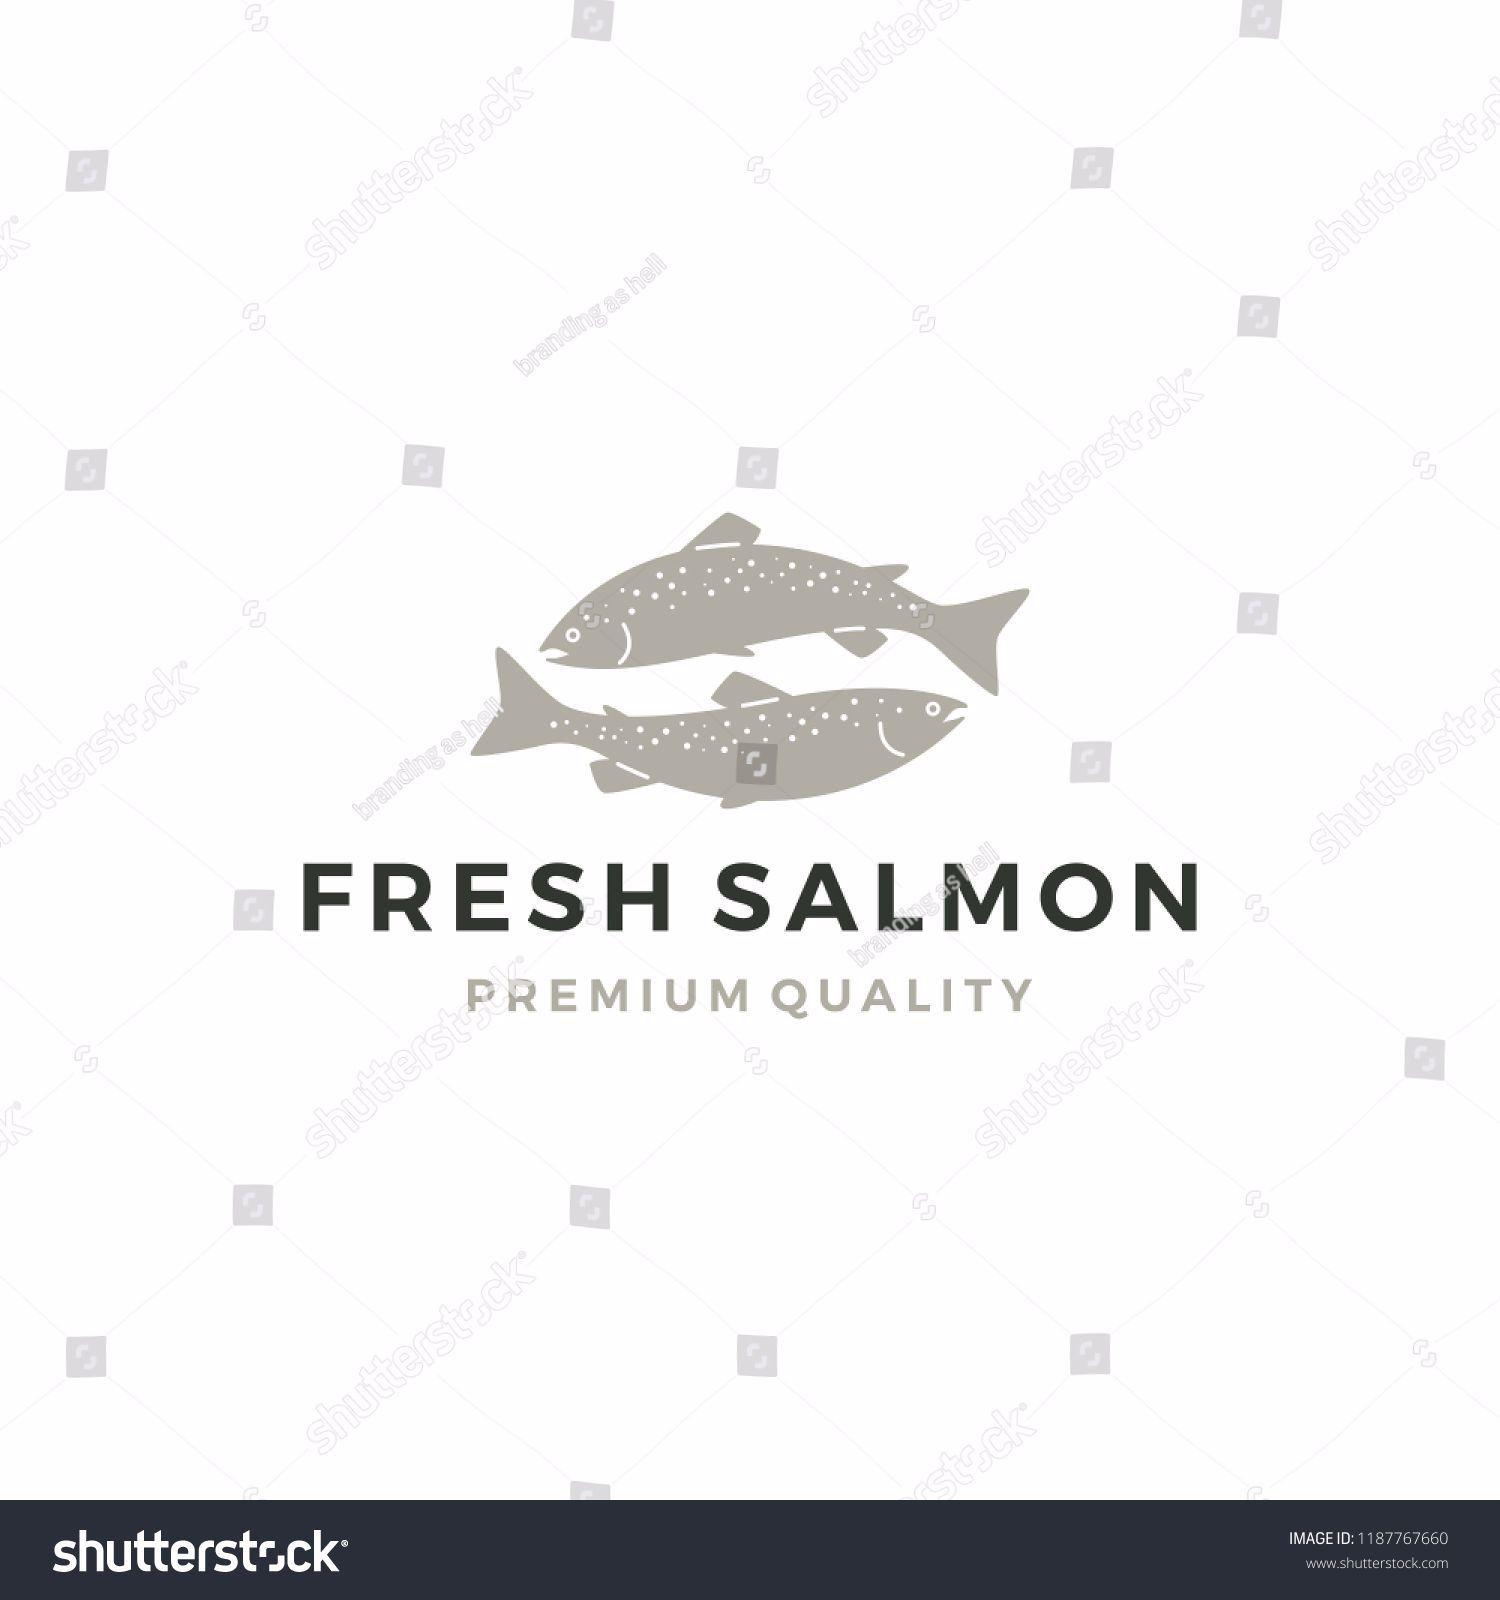 salmon fish logo seafood label badge vector sticker download Salmonlogo